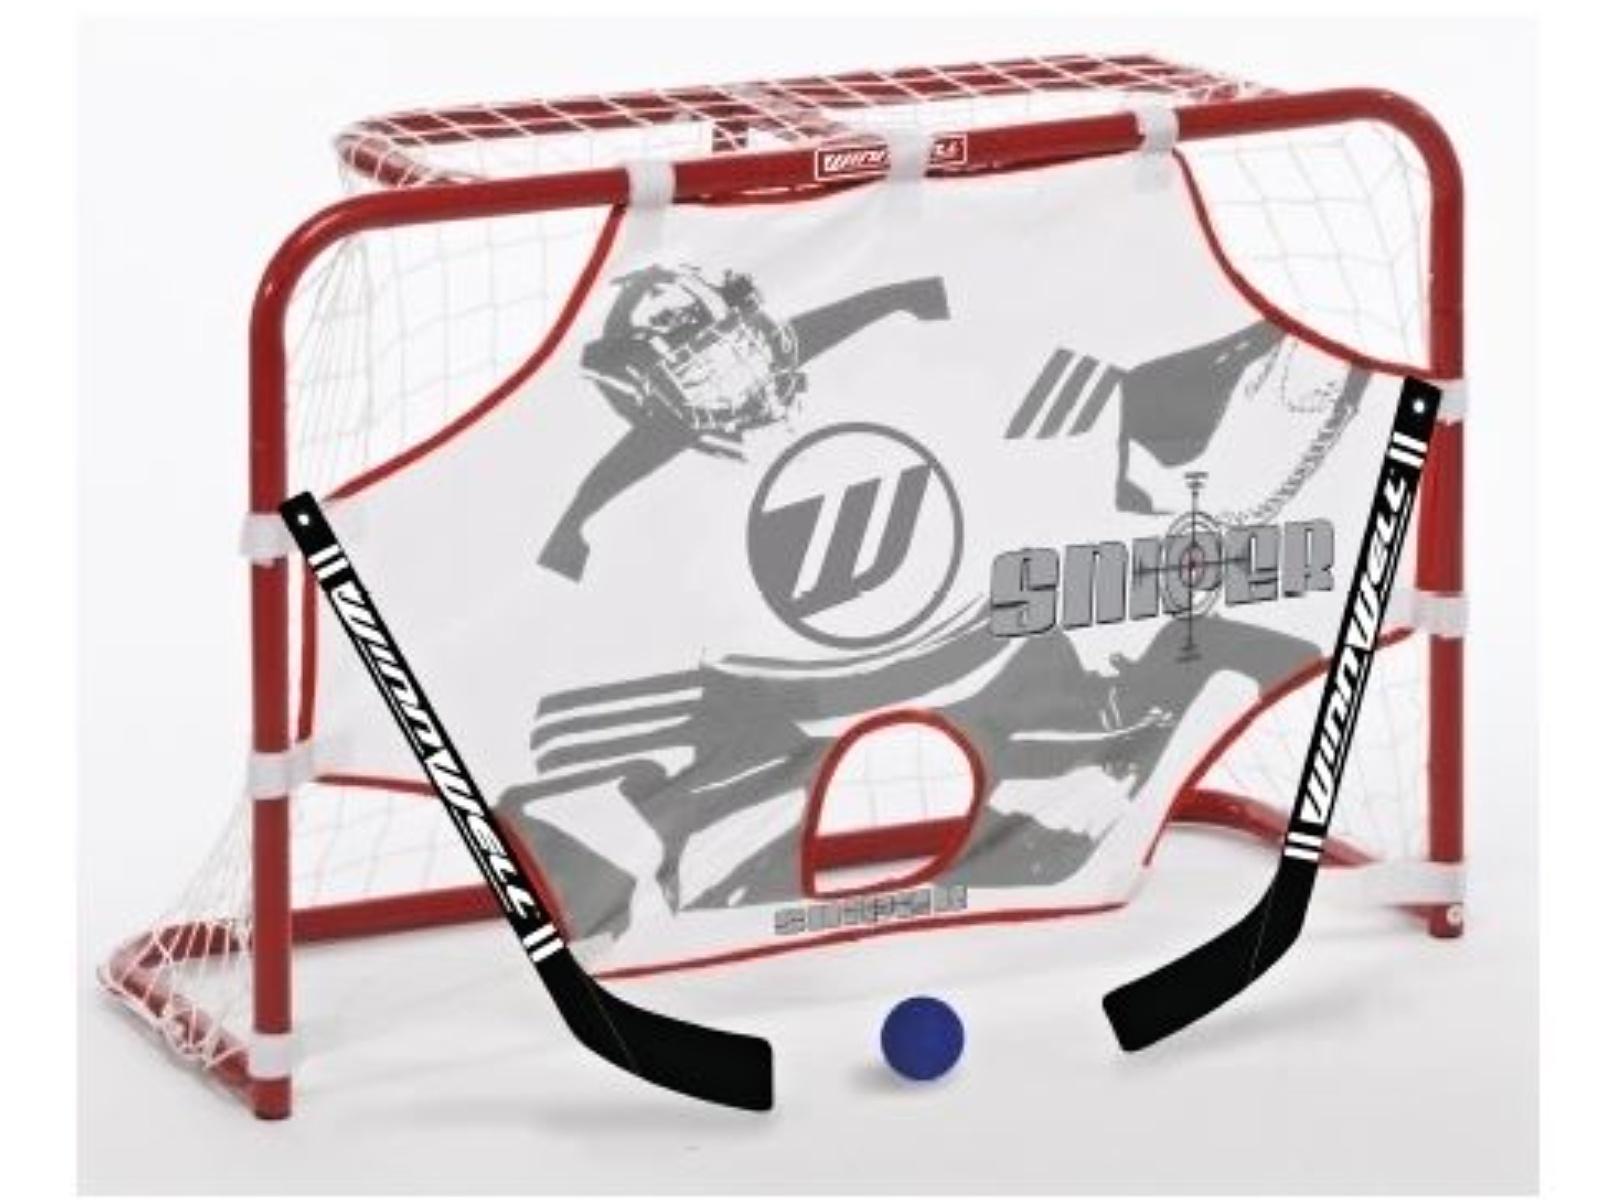 Detská hokejová skladacia bránka Mini set 32